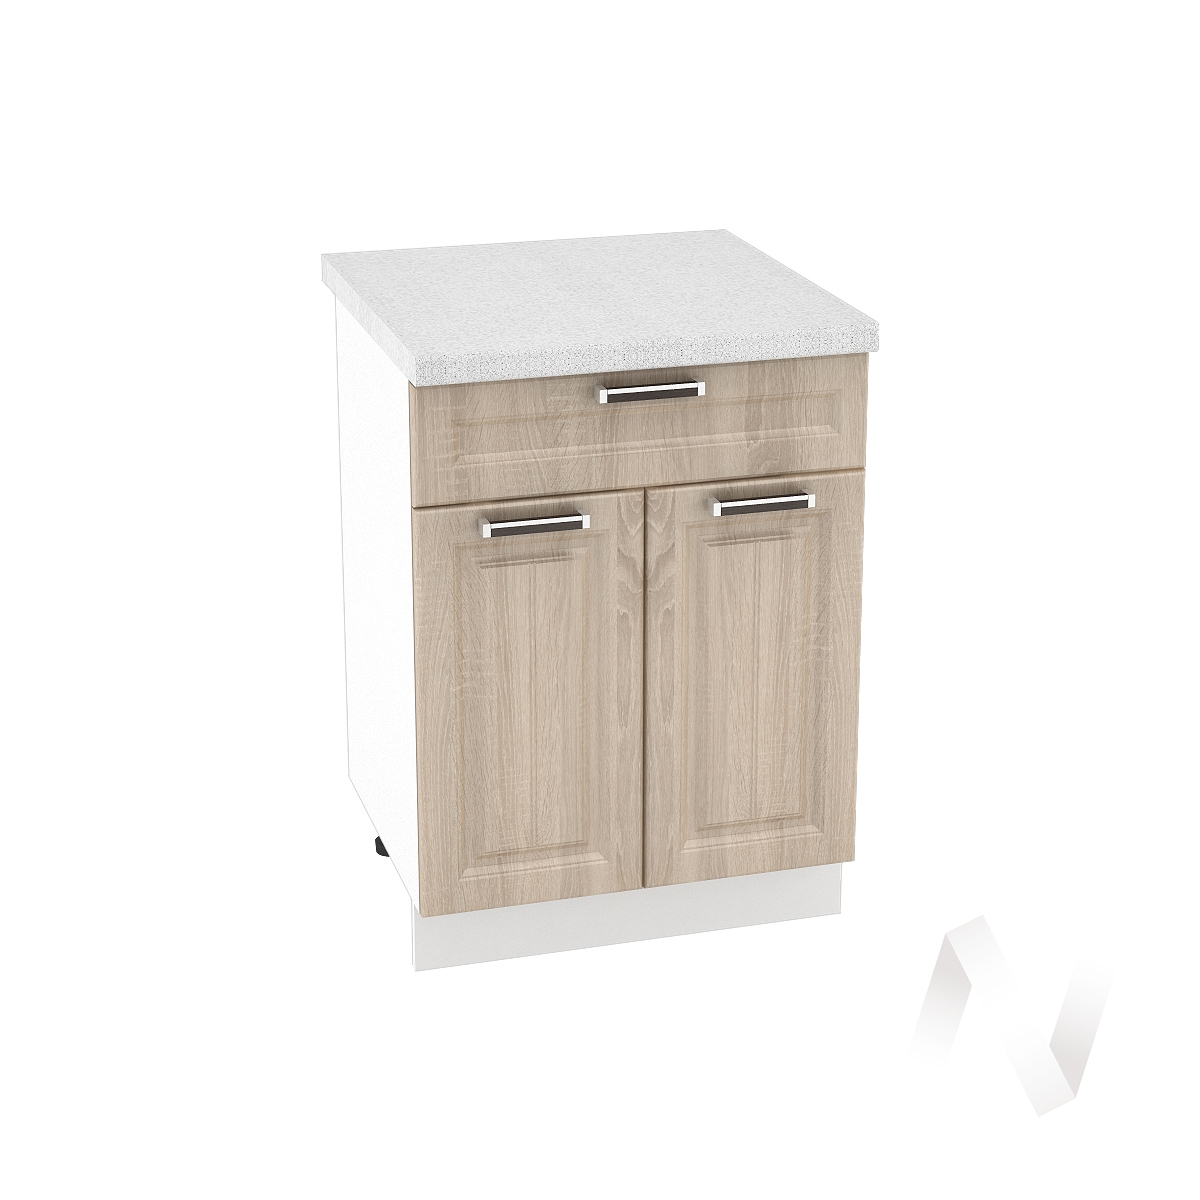 "Кухня ""Прага"": Шкаф нижний с ящиком 600, ШН1Я 600 М (дуб сонома/корпус белый)"